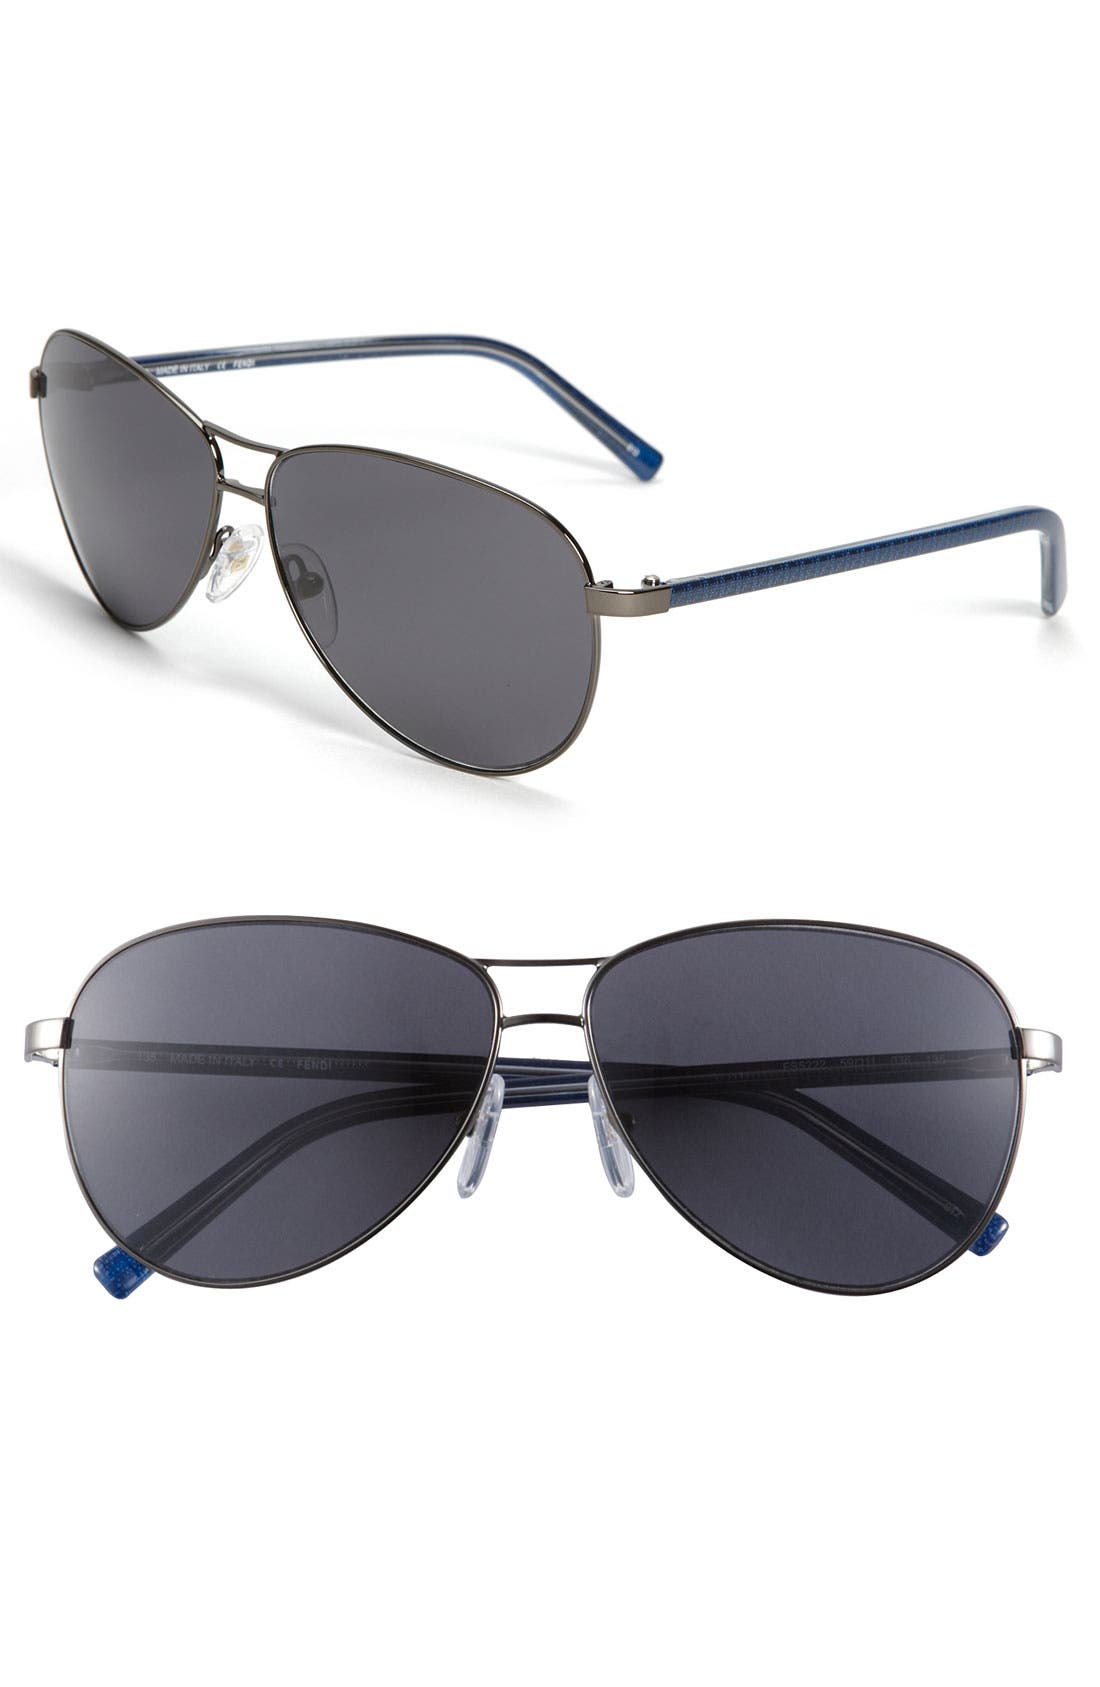 Main Image - Fendi Polarized Aviator Sunglasses